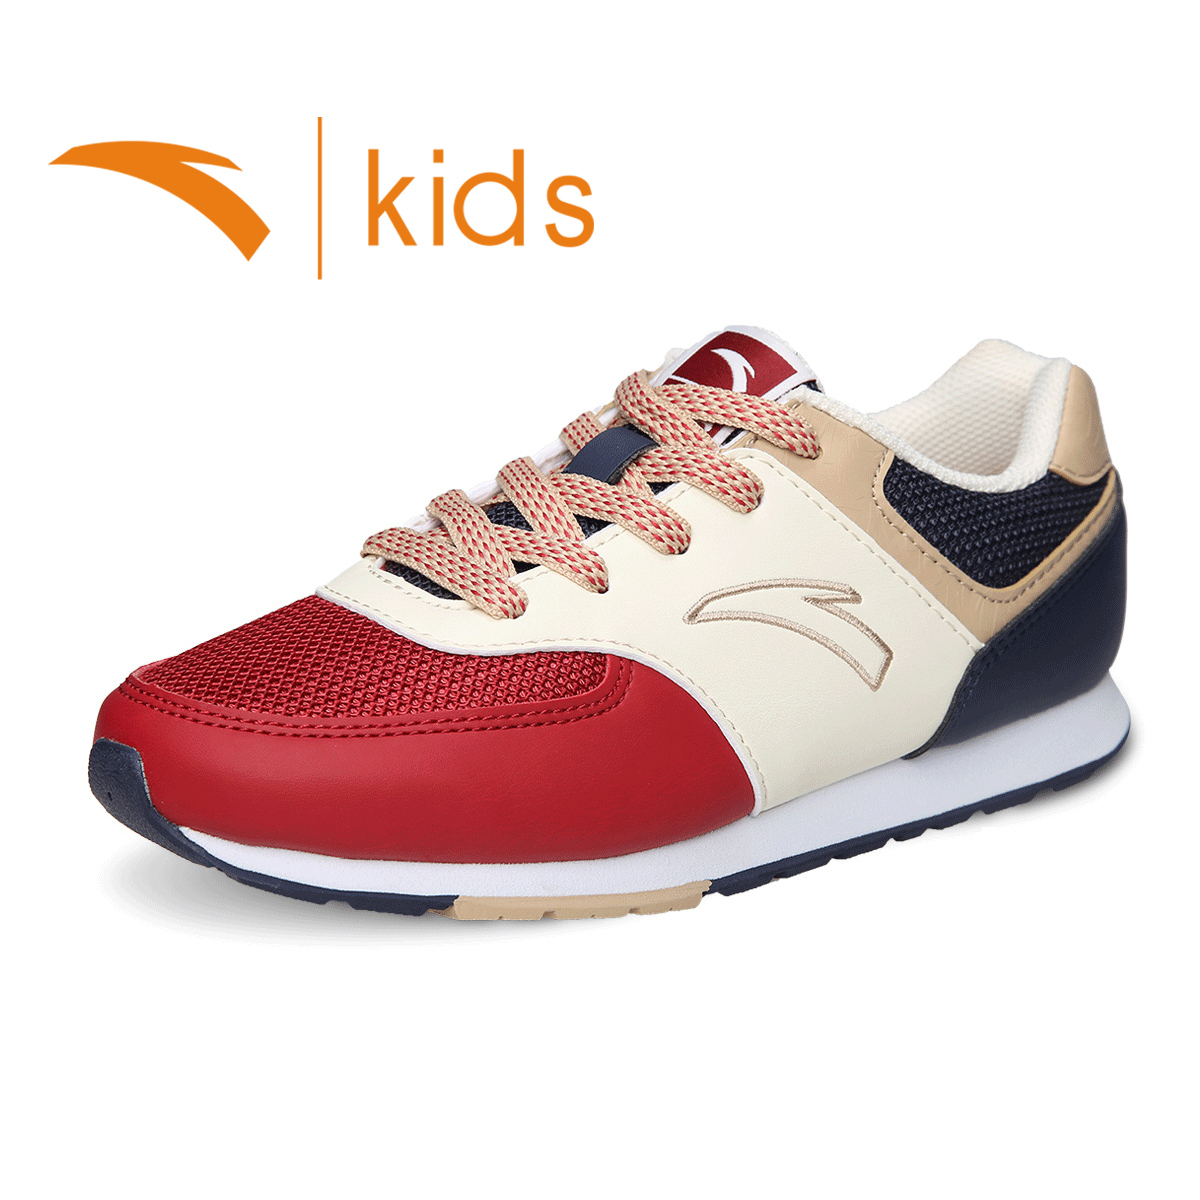 buy big boy boy sports shoes anta shoes running shoes